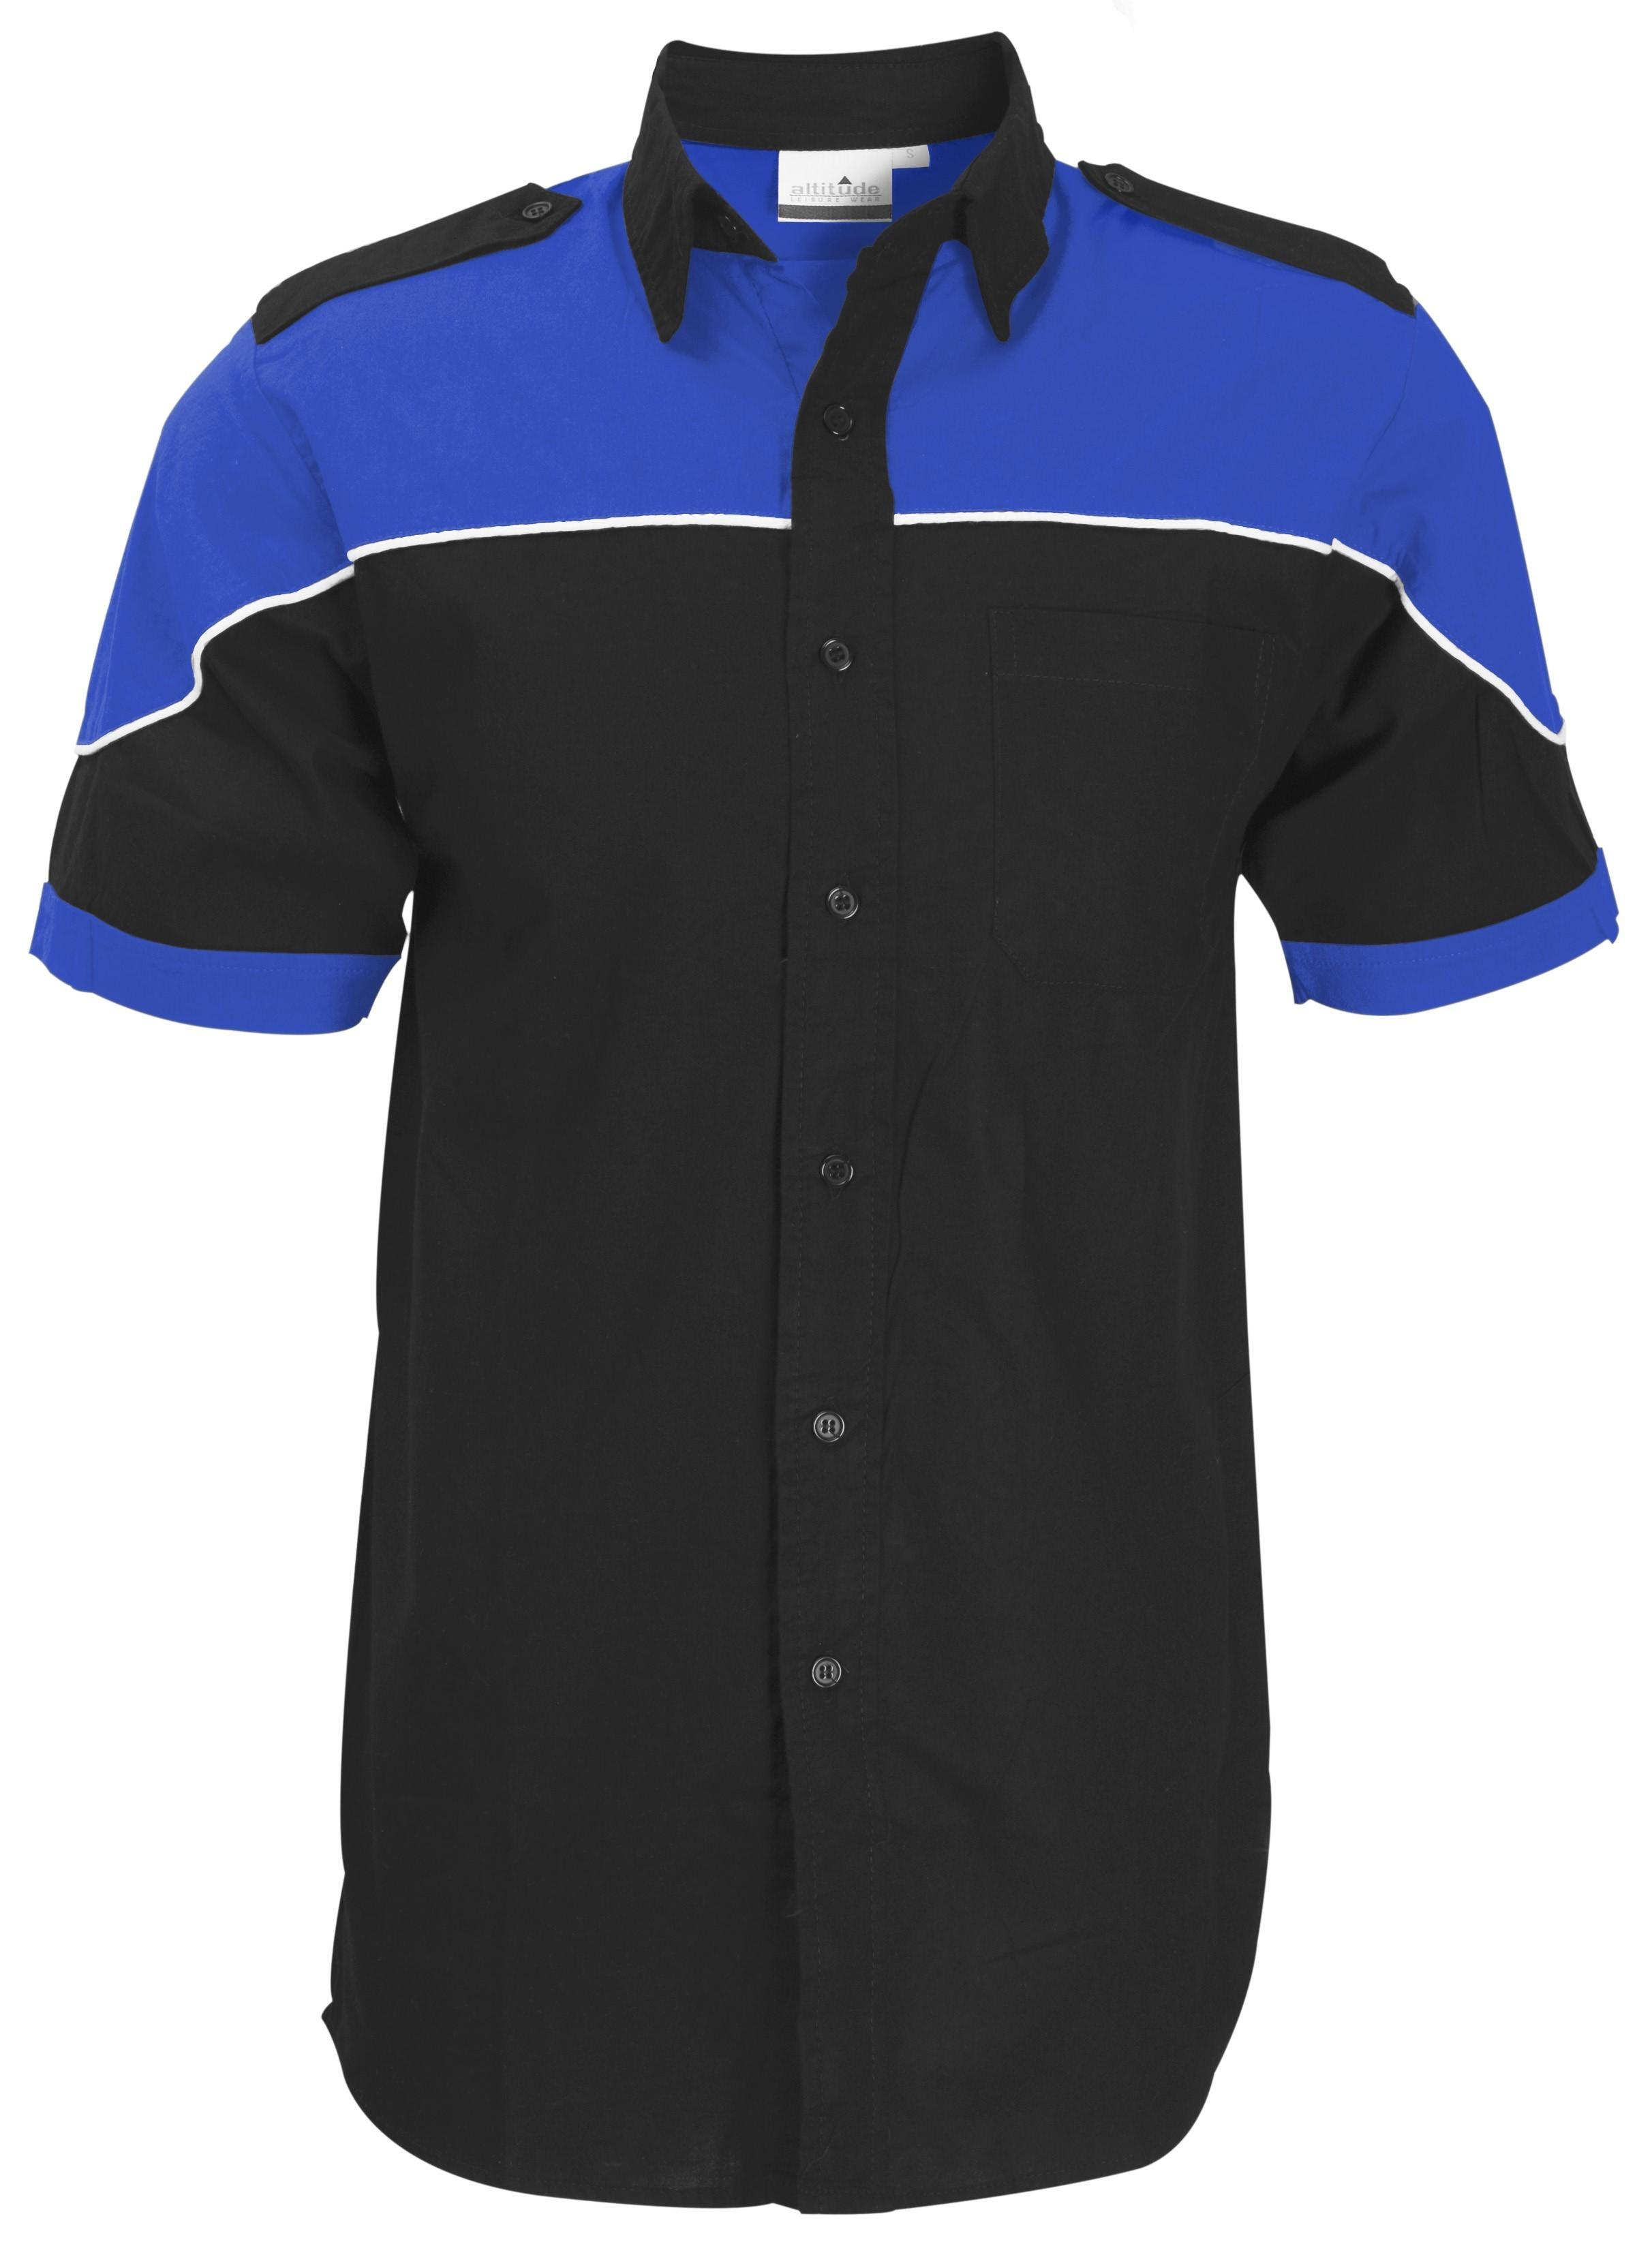 Mens Short Sleeve Racer Shirt